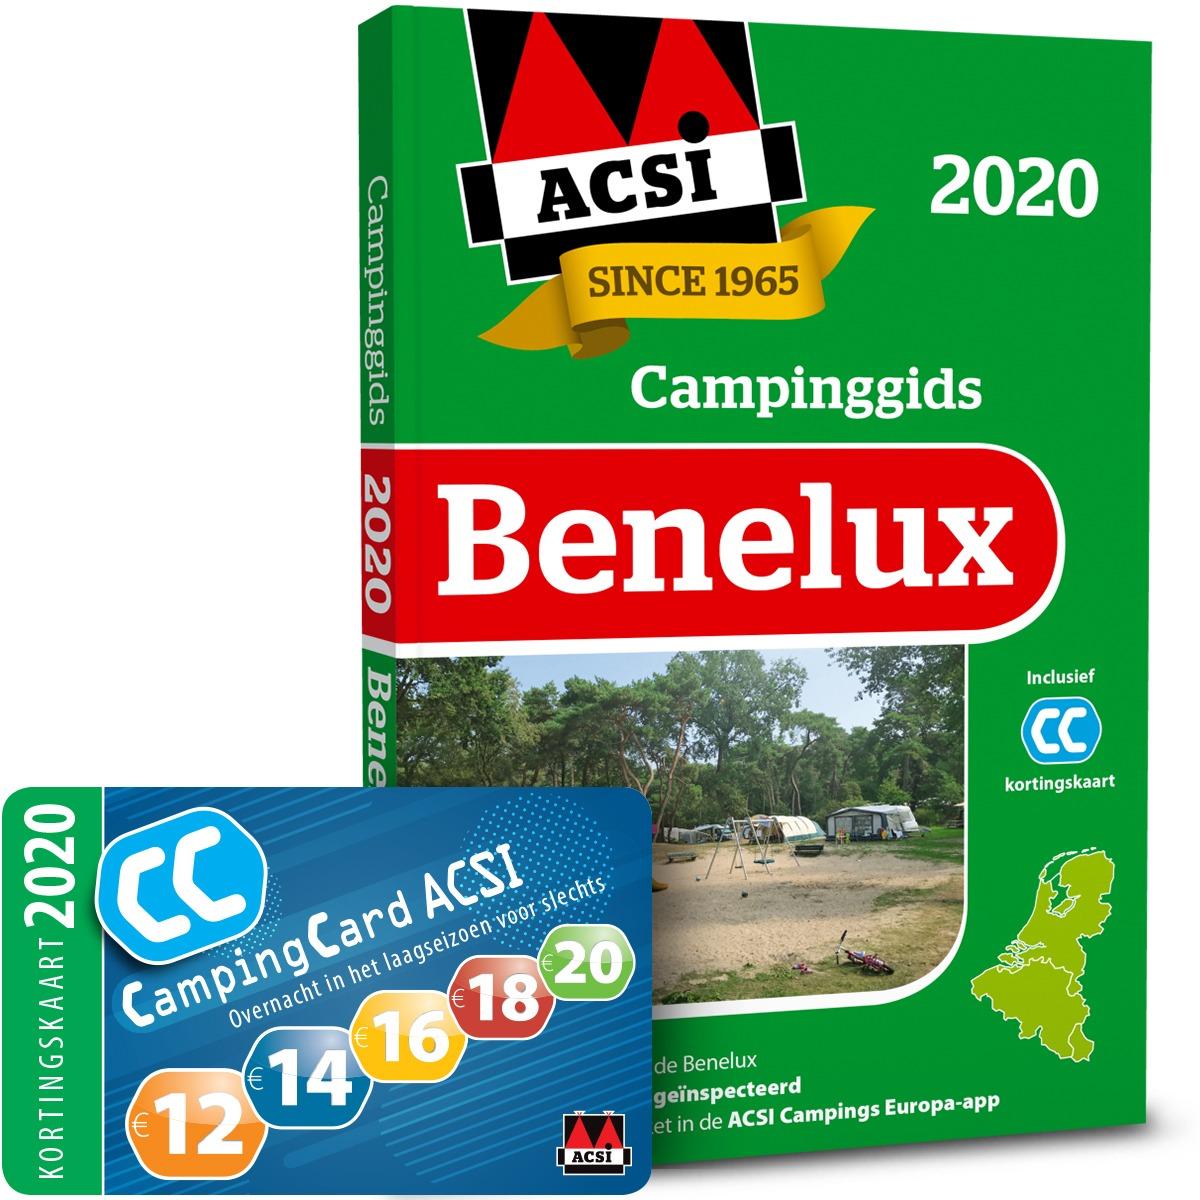 ACSI Campinggids Benelux